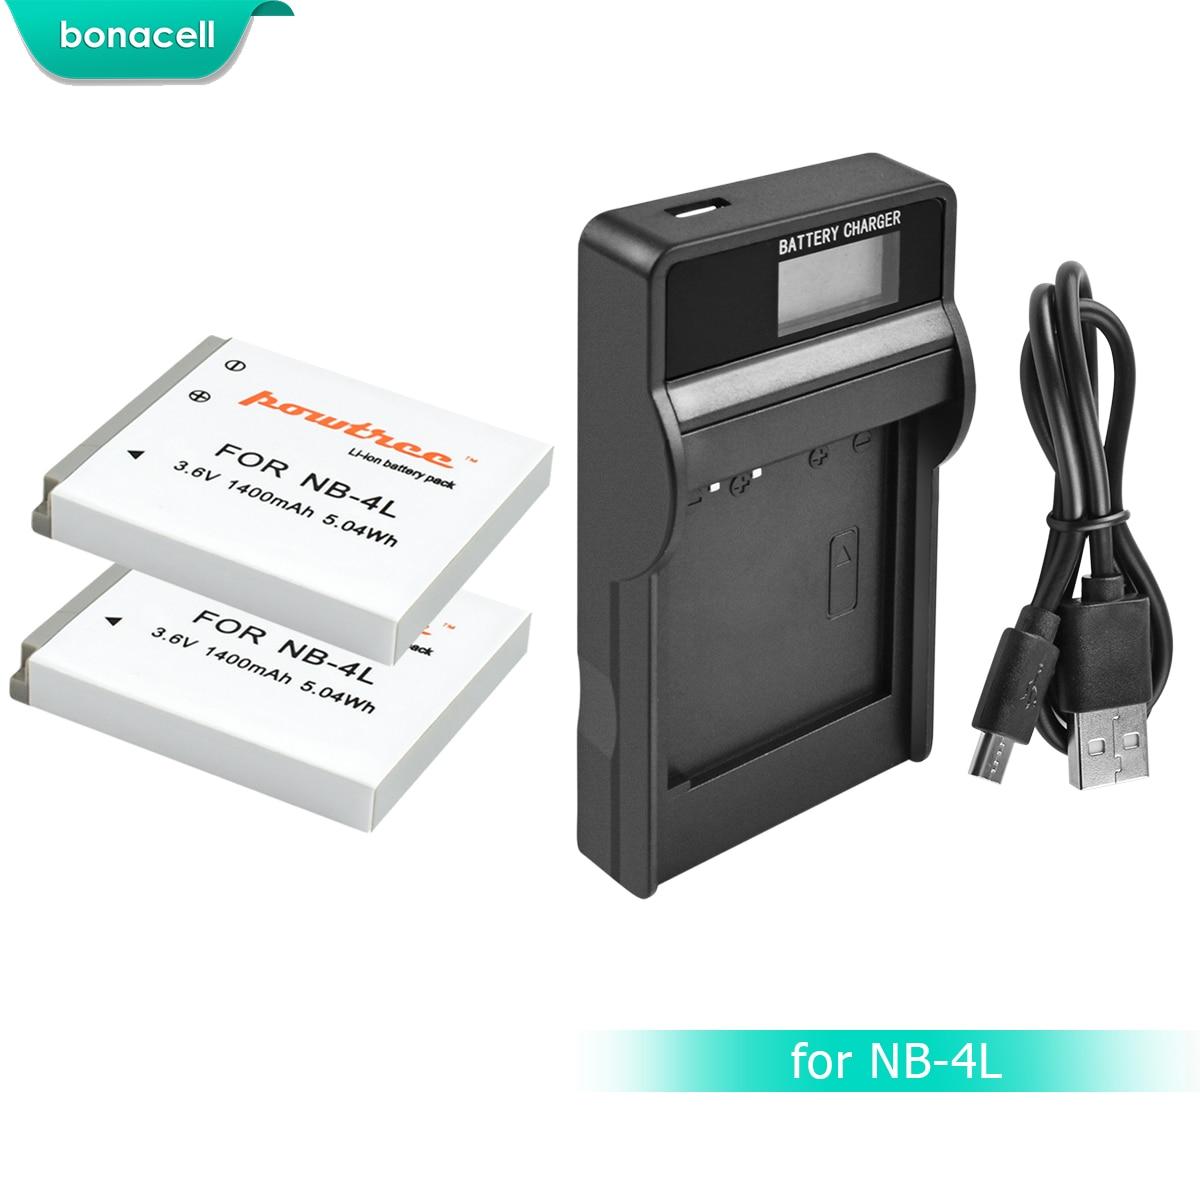 Batería Li-ion Para canondigital Ixy Digital 930 es Digital Ixus 200 Ixus 300